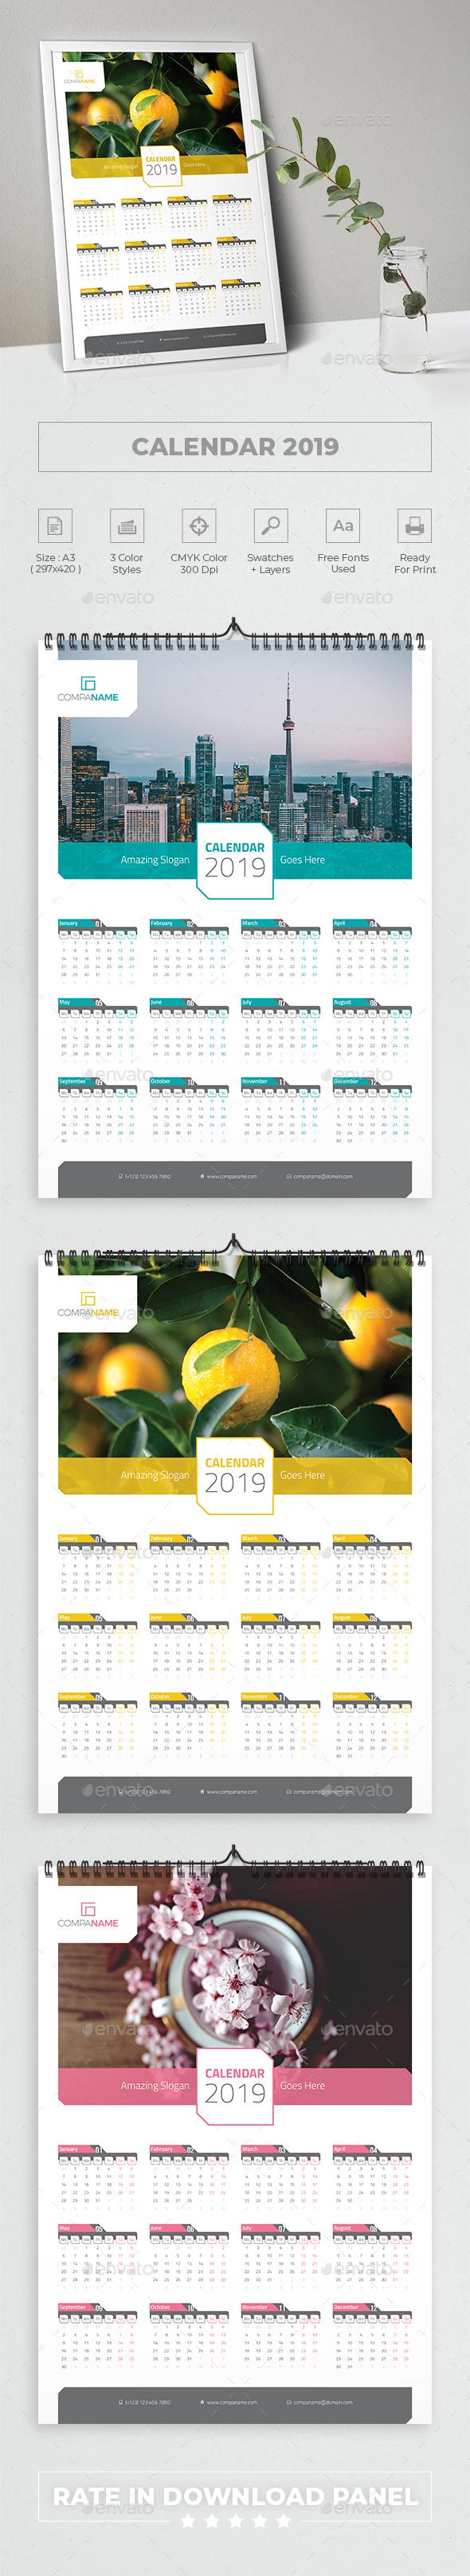 Calendar Poster 2019 - Calendars Stationery